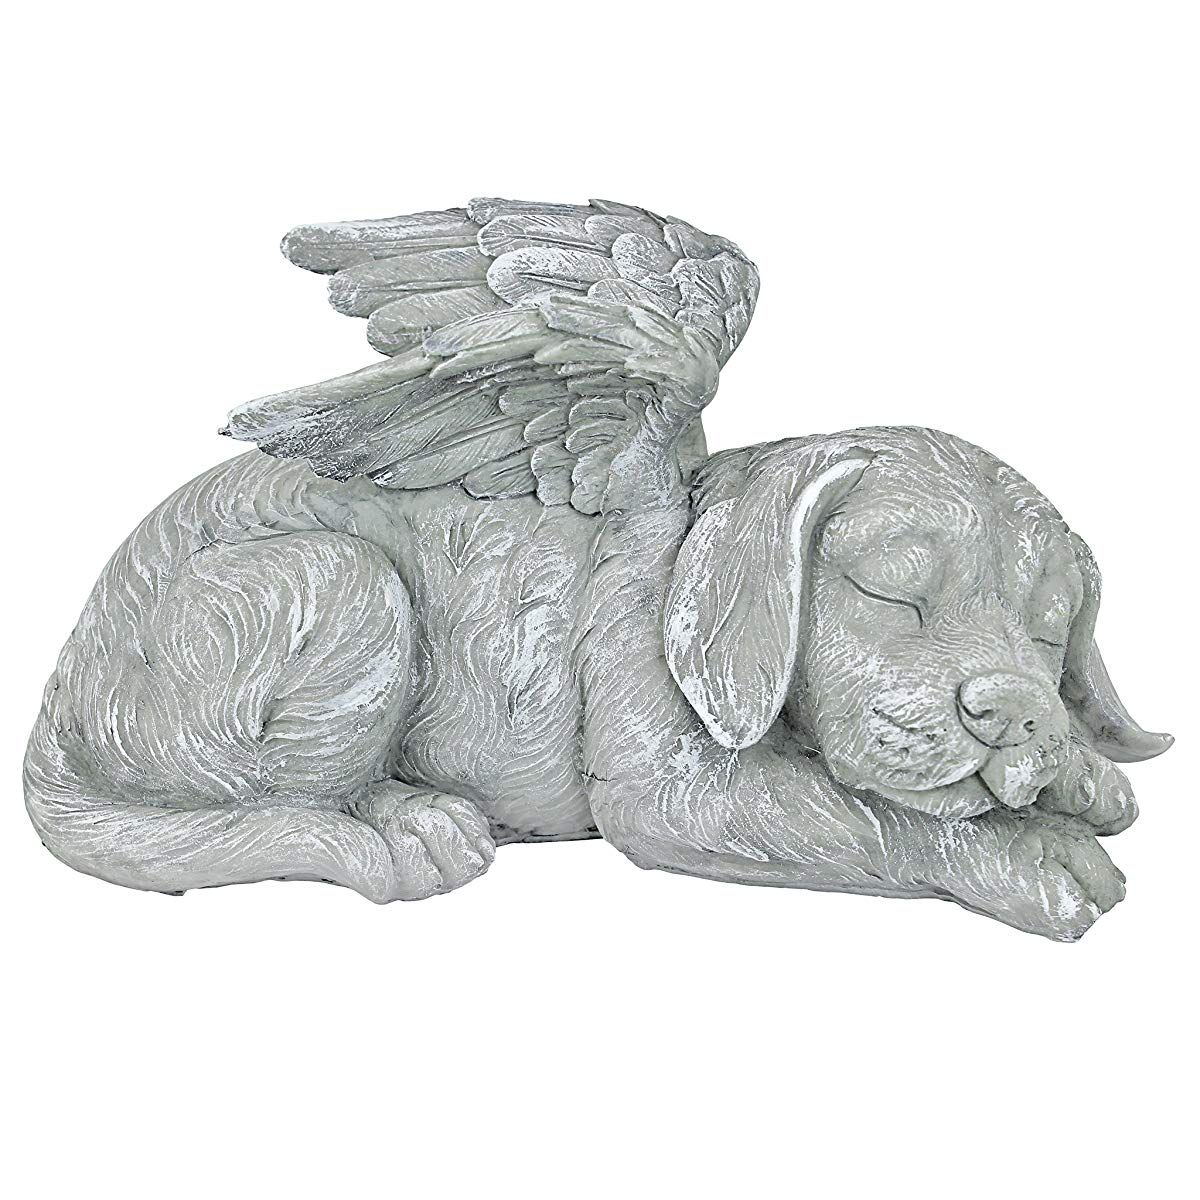 Design Toscano Dog Angel Pet Memorialgrave Marker Tribute Statue 10 Inch Polyresin Stone Finish Statue Outdoor Garden Statues Dog Angel